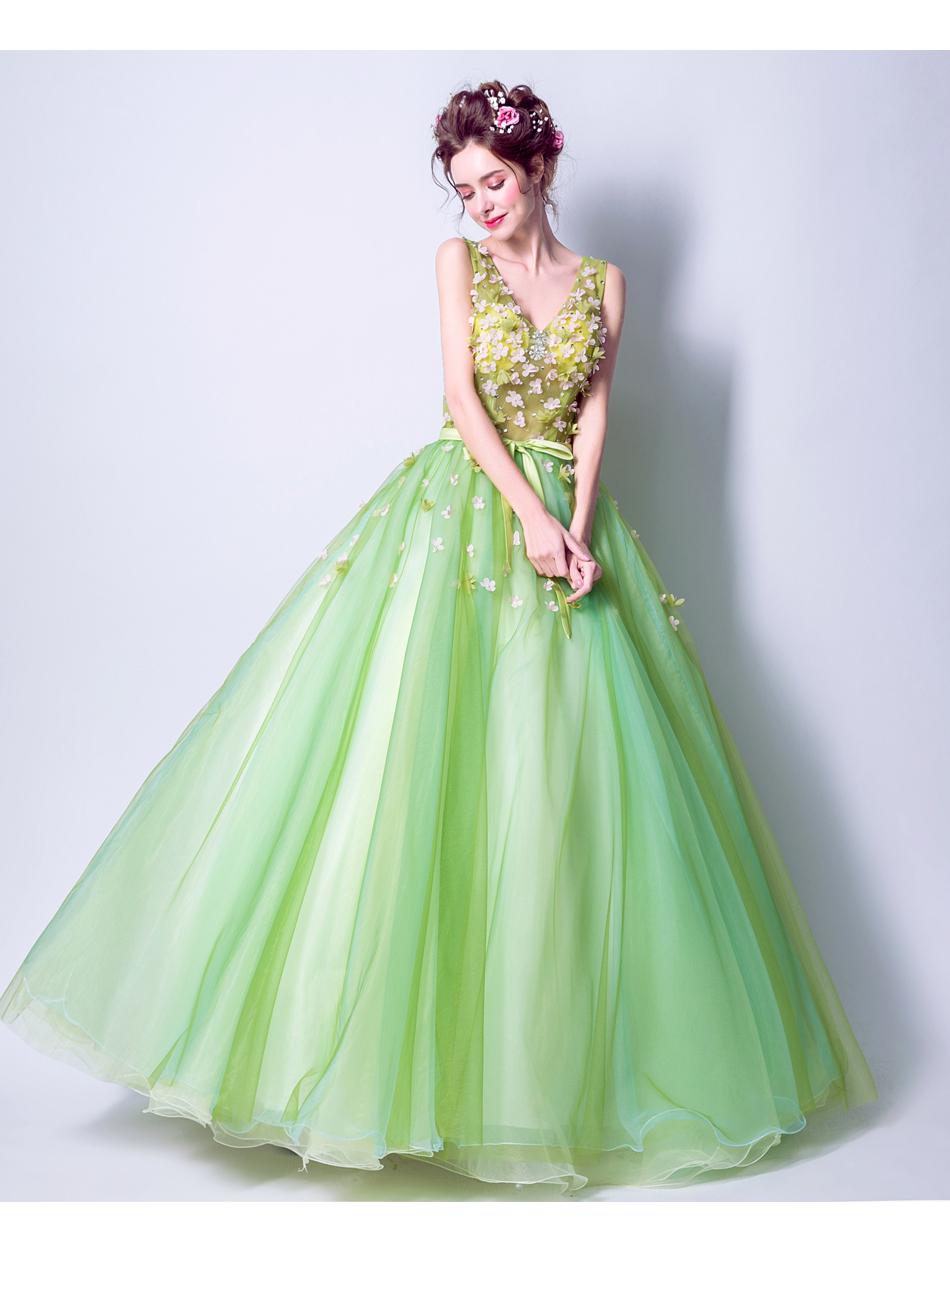 Angel Wedding Dress Marriage Bride Bridal Gown Vestido De Noiva 2017Soft powder, Qingjian Lvxian beauty, petals, green 9718 16